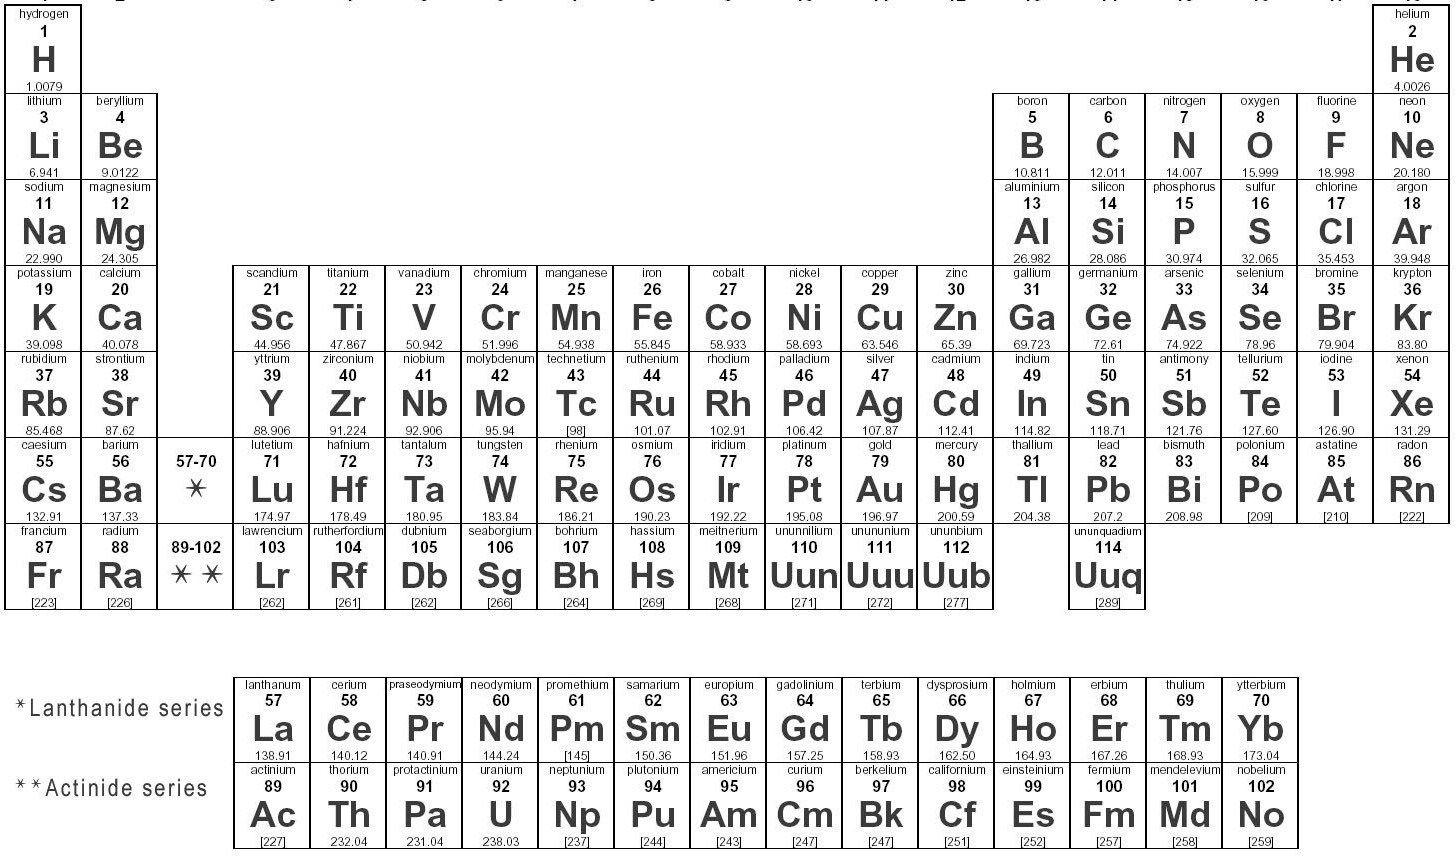 Periodic table of devop tools credit xebialabsg 1141639 periodic table of devop tools credit xebialabsg 1141639 devops pinterest gamestrikefo Images